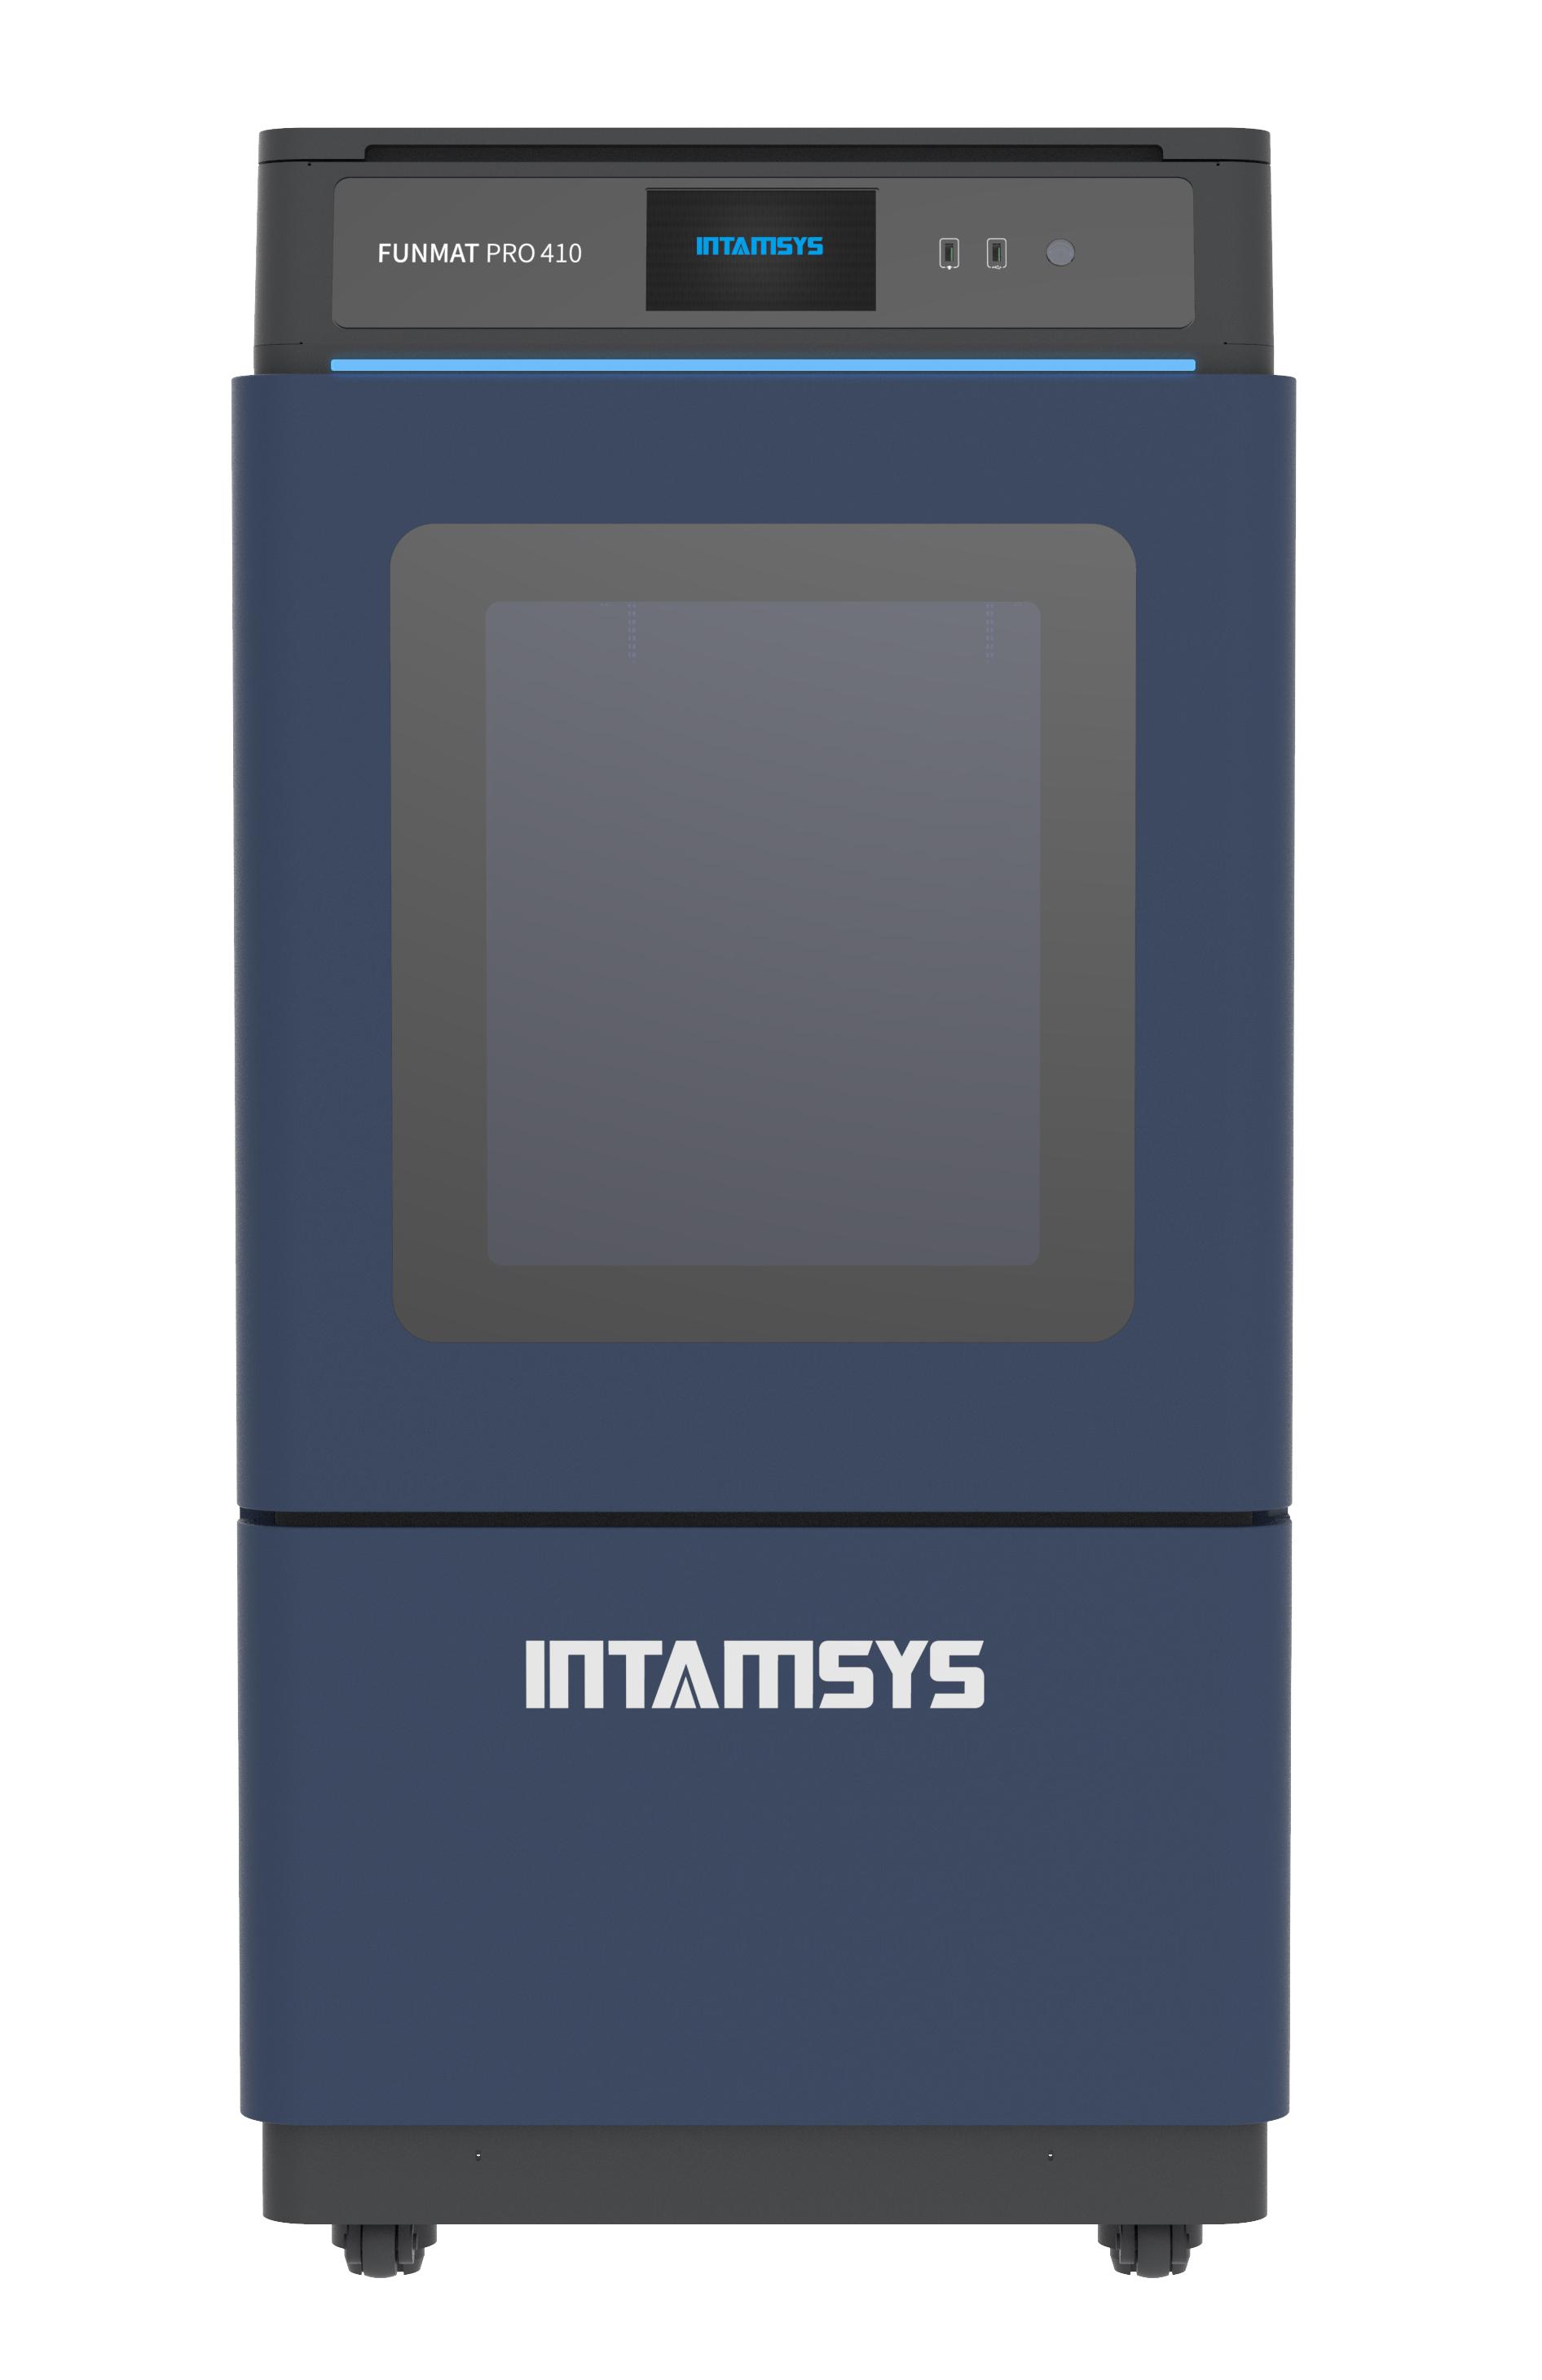 INTAMSYS - FUNMAT PRO 410